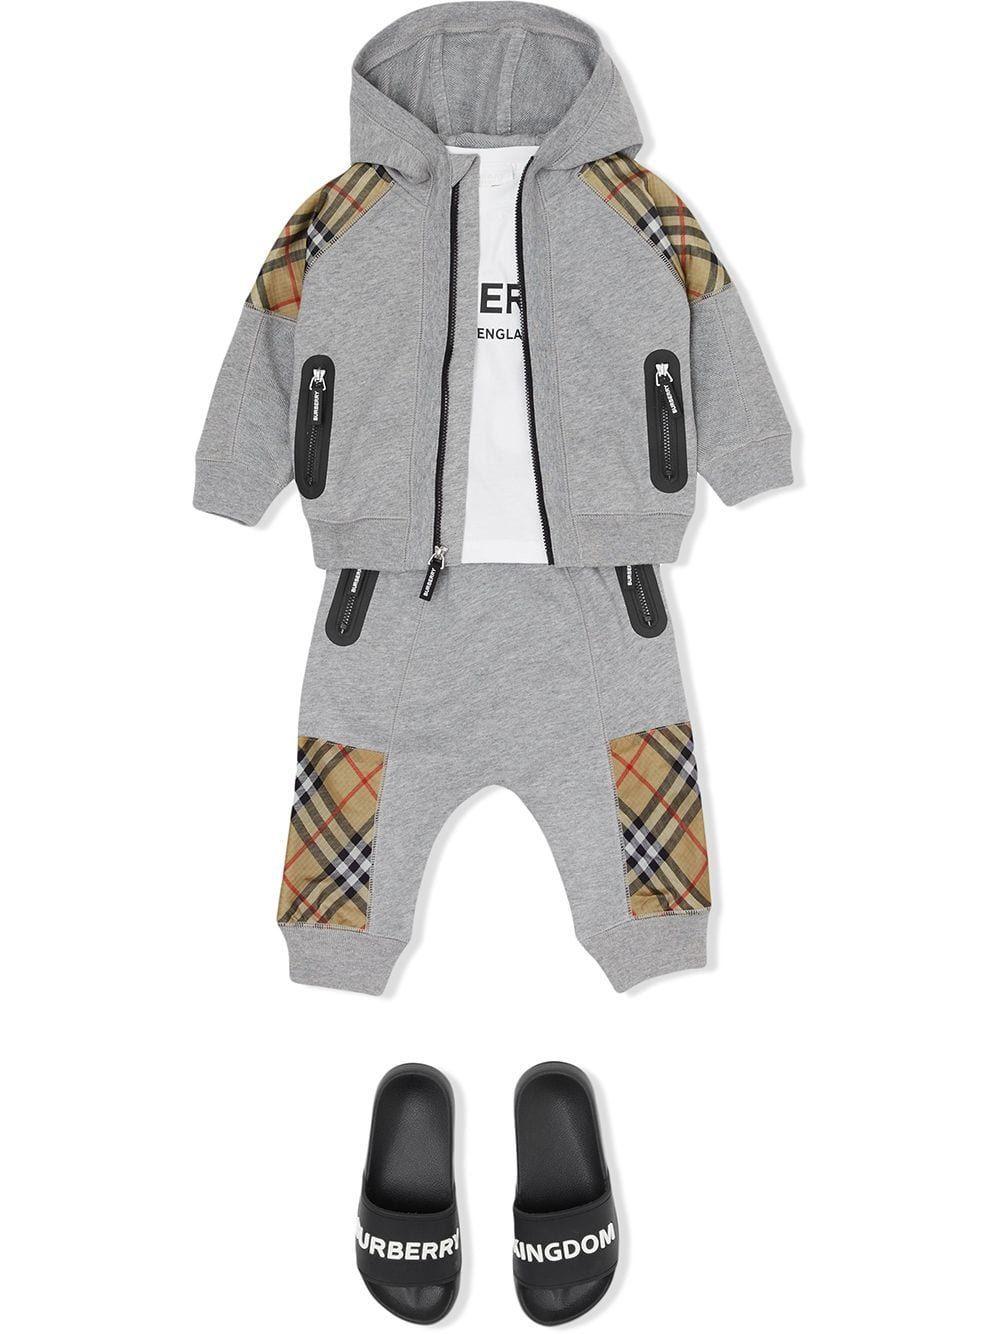 BURBERRY BABY BOYS 8011053 GREY COTTON SWEATSHIRT